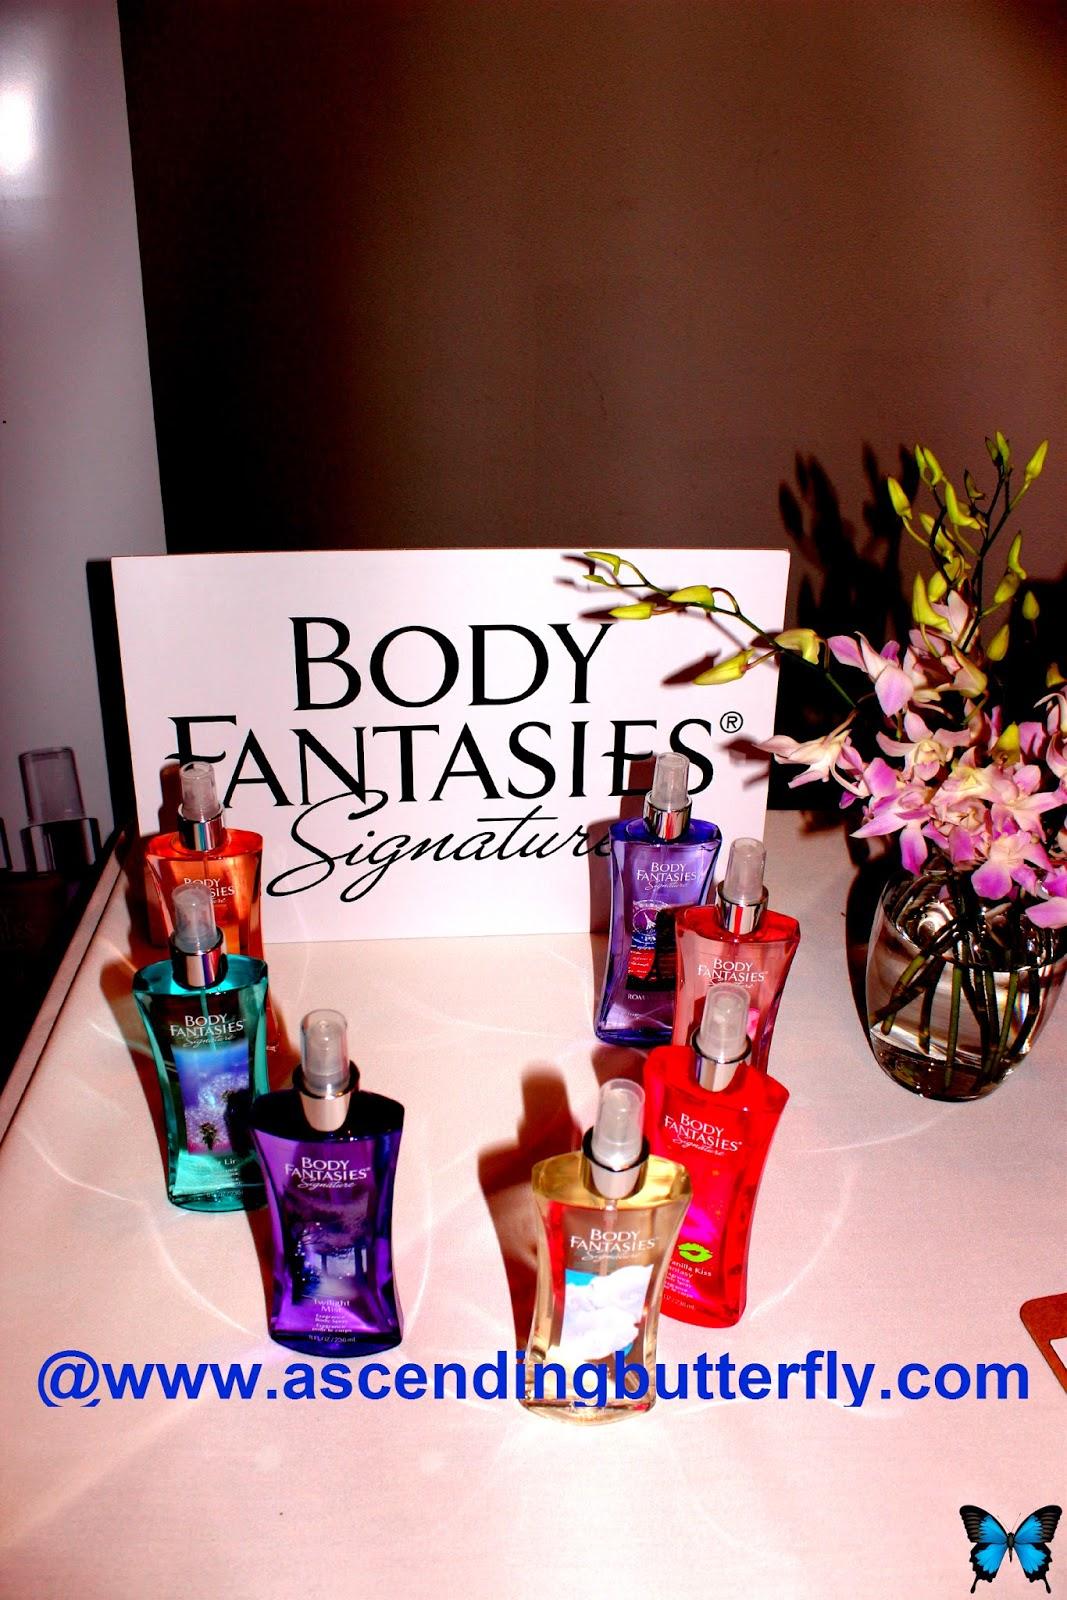 Body Fantasies Signature at Getting Gorgeous 2014, Fragrance Rebel, parfums de coeur